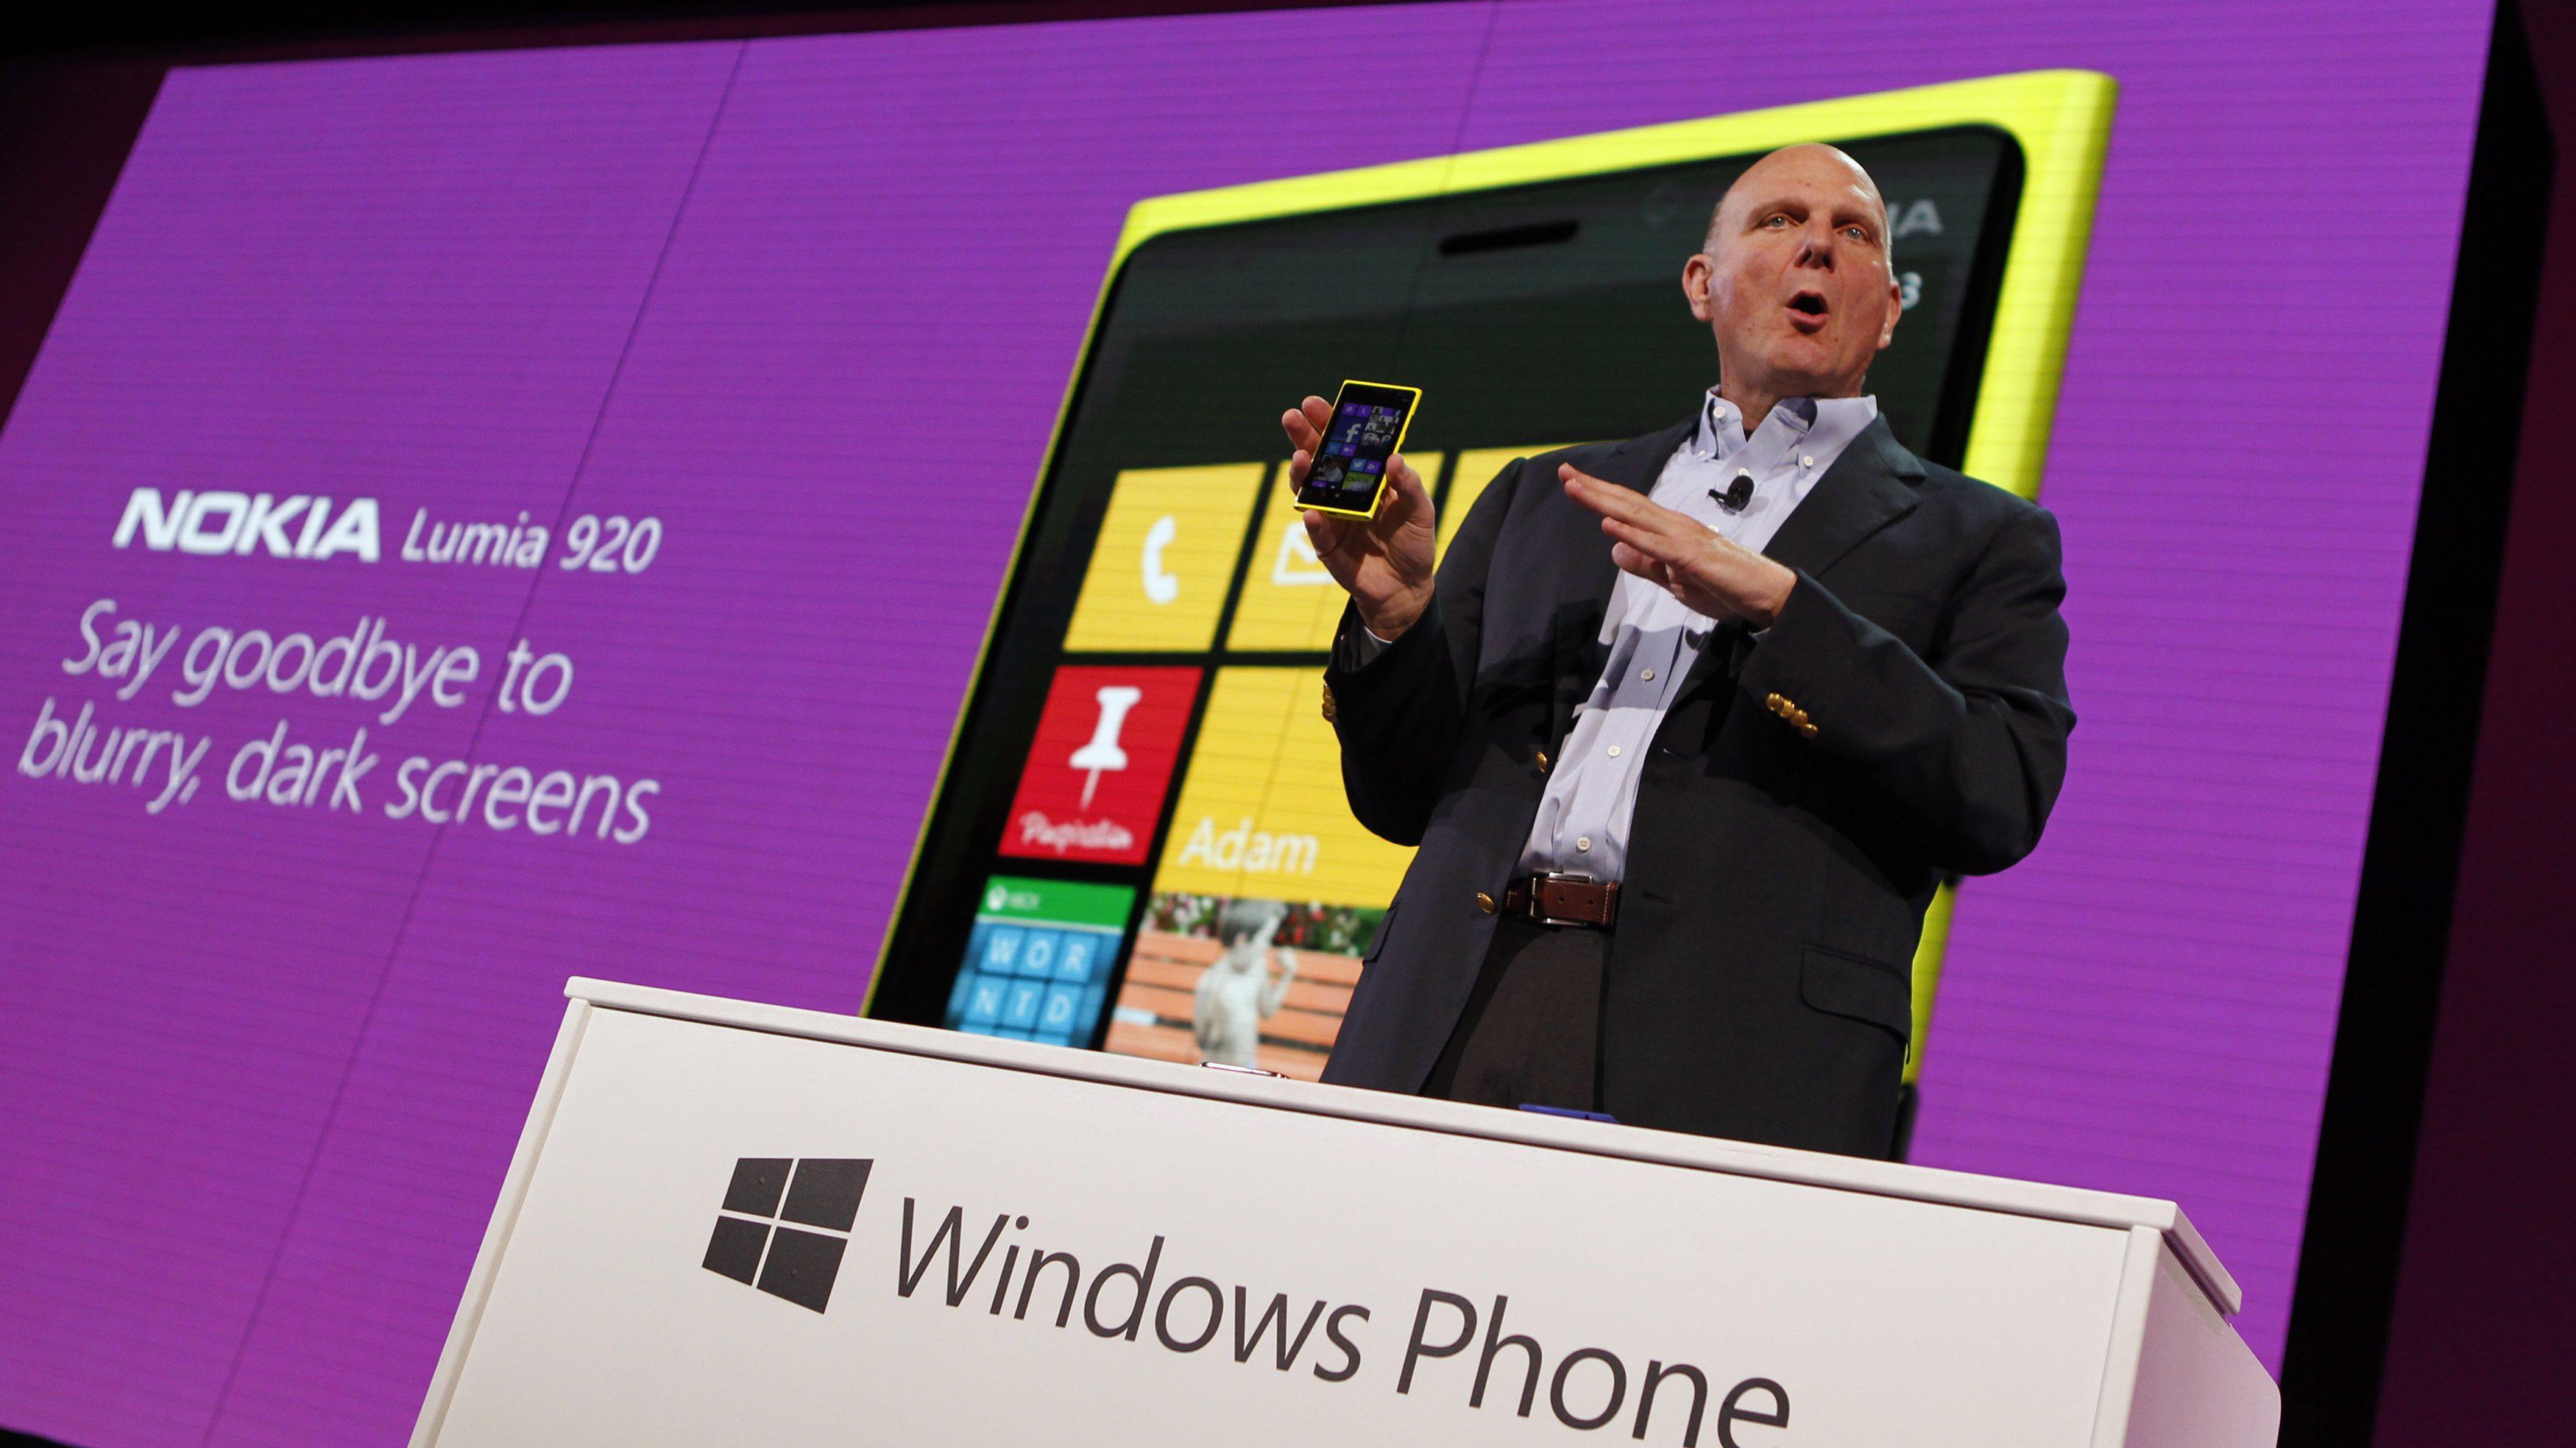 Microsoft CEO Ballmer displays a Nokia Lumia 920 featuring Windows Phone 8 during an event in San Francisco